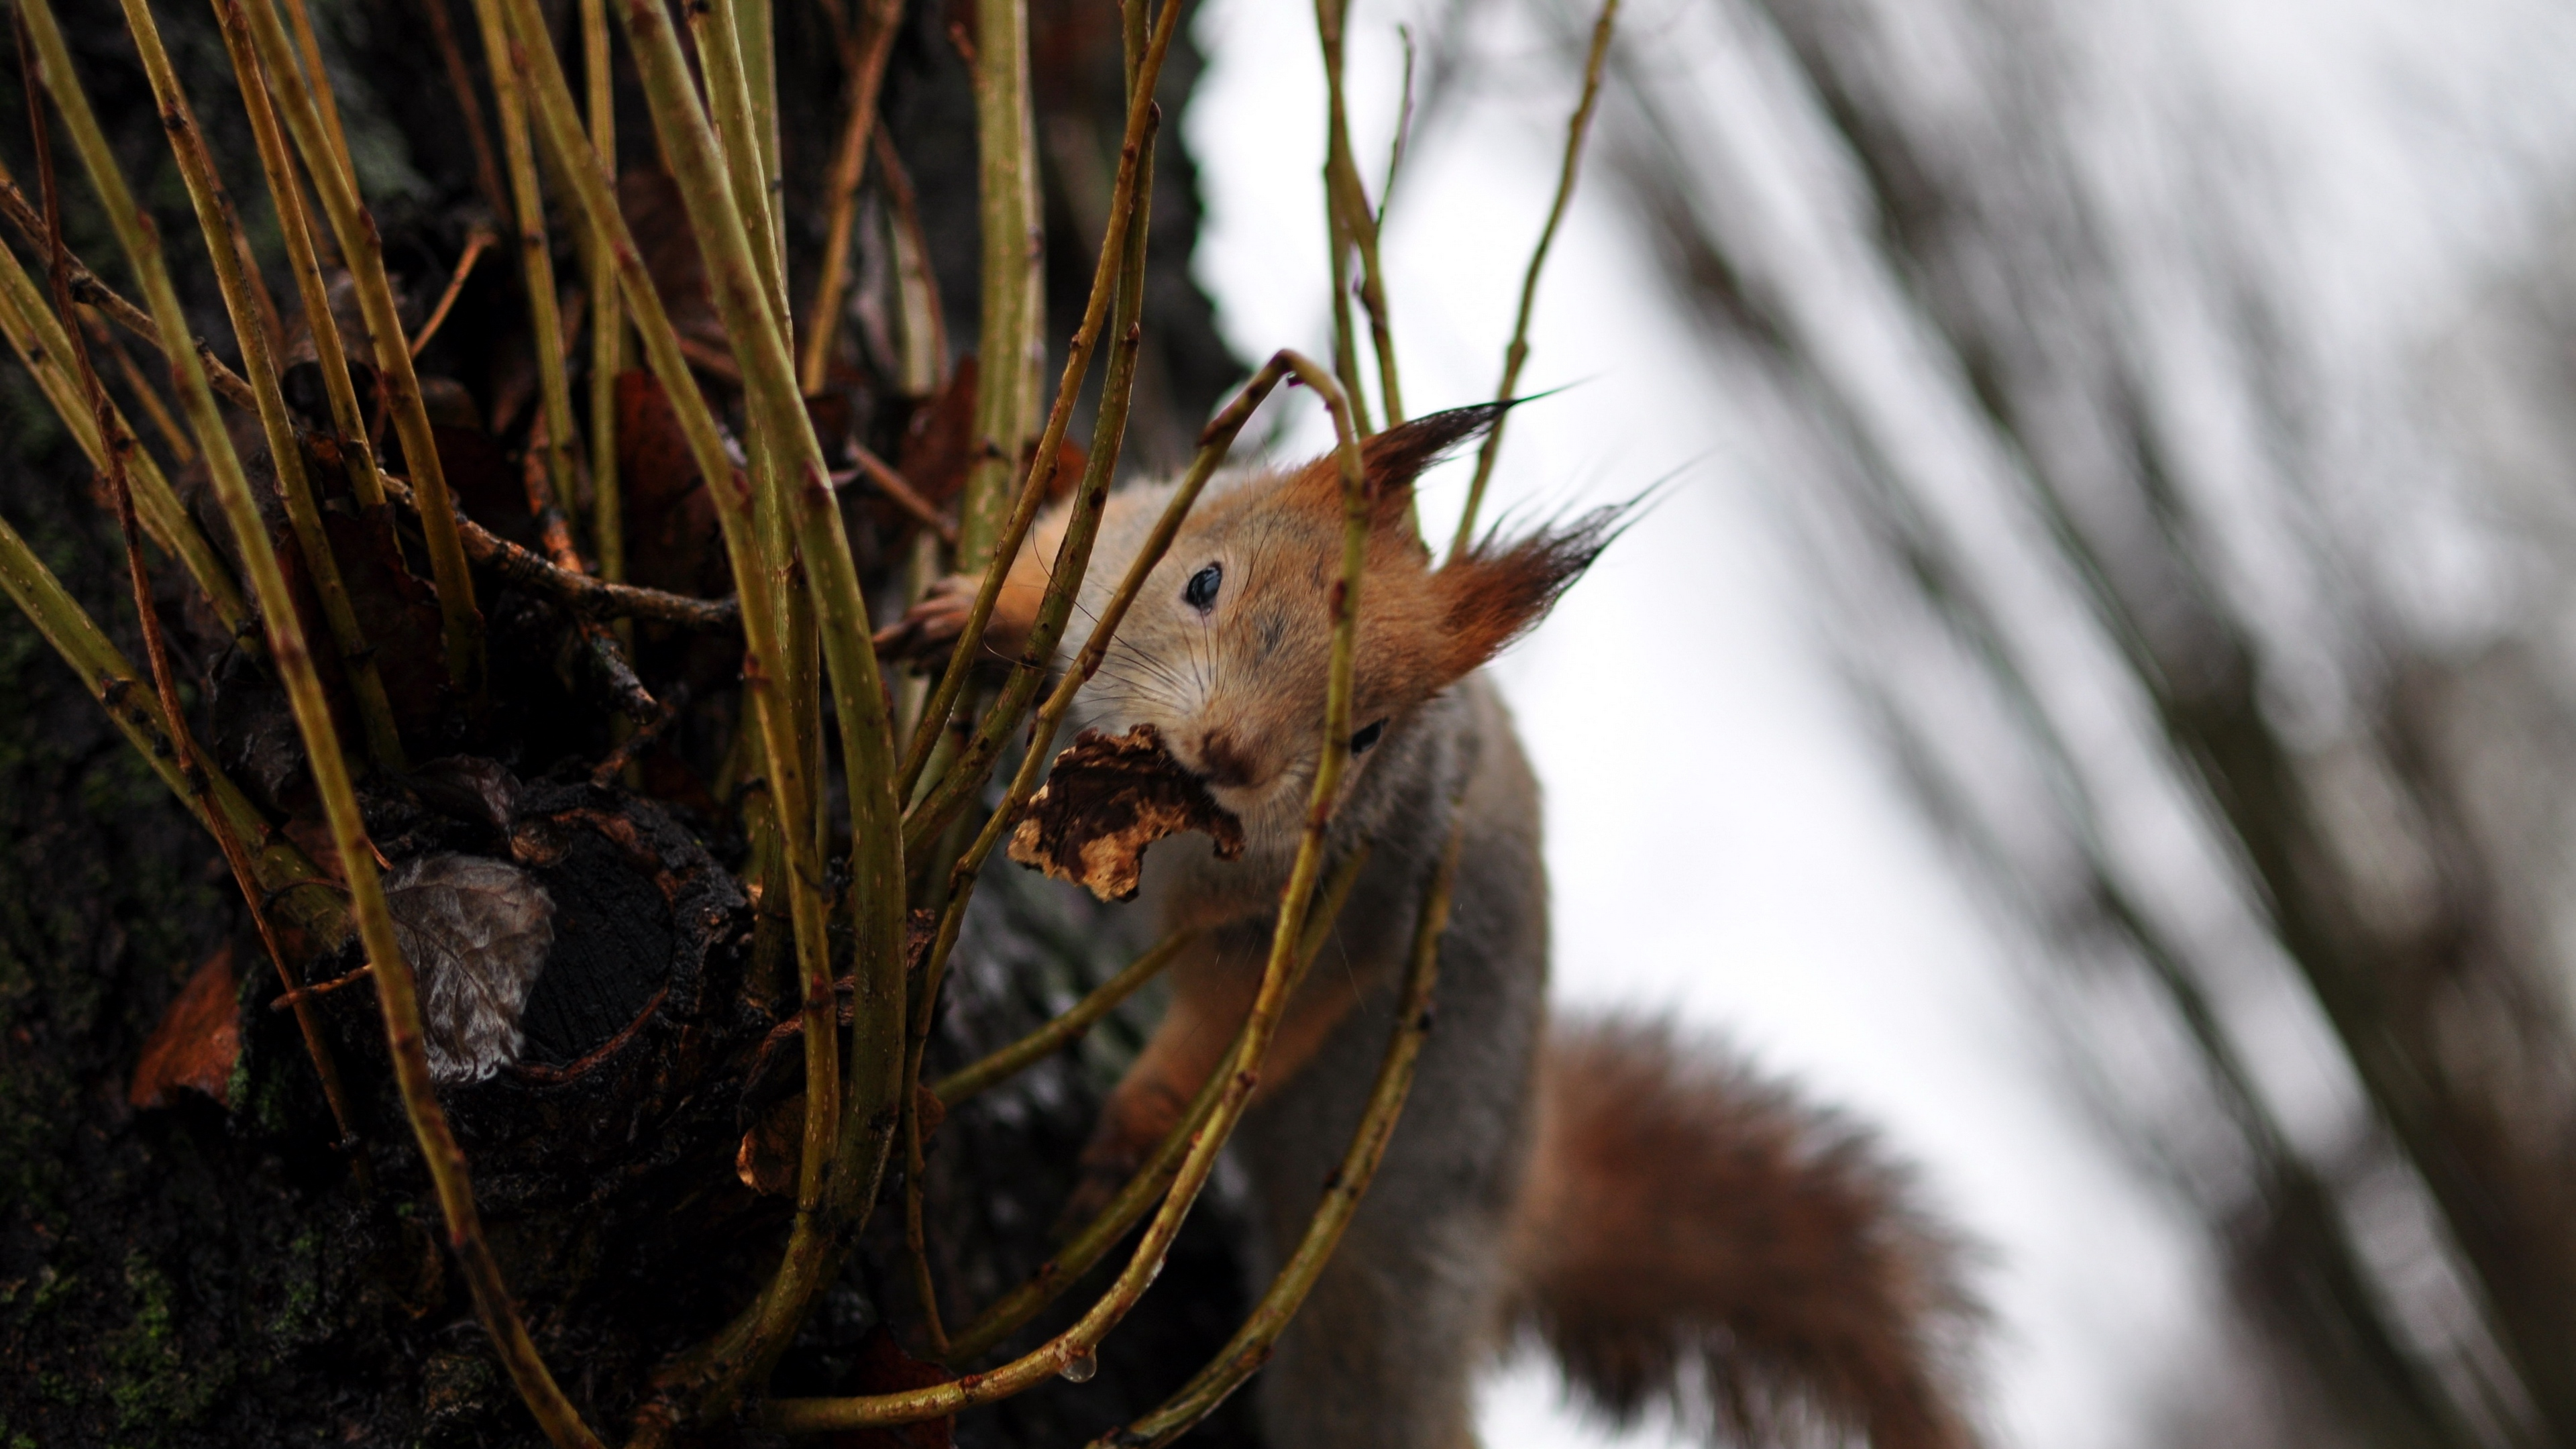 squirrel grass climb 4k 1542242646 - squirrel, grass, climb 4k - Squirrel, Grass, climb